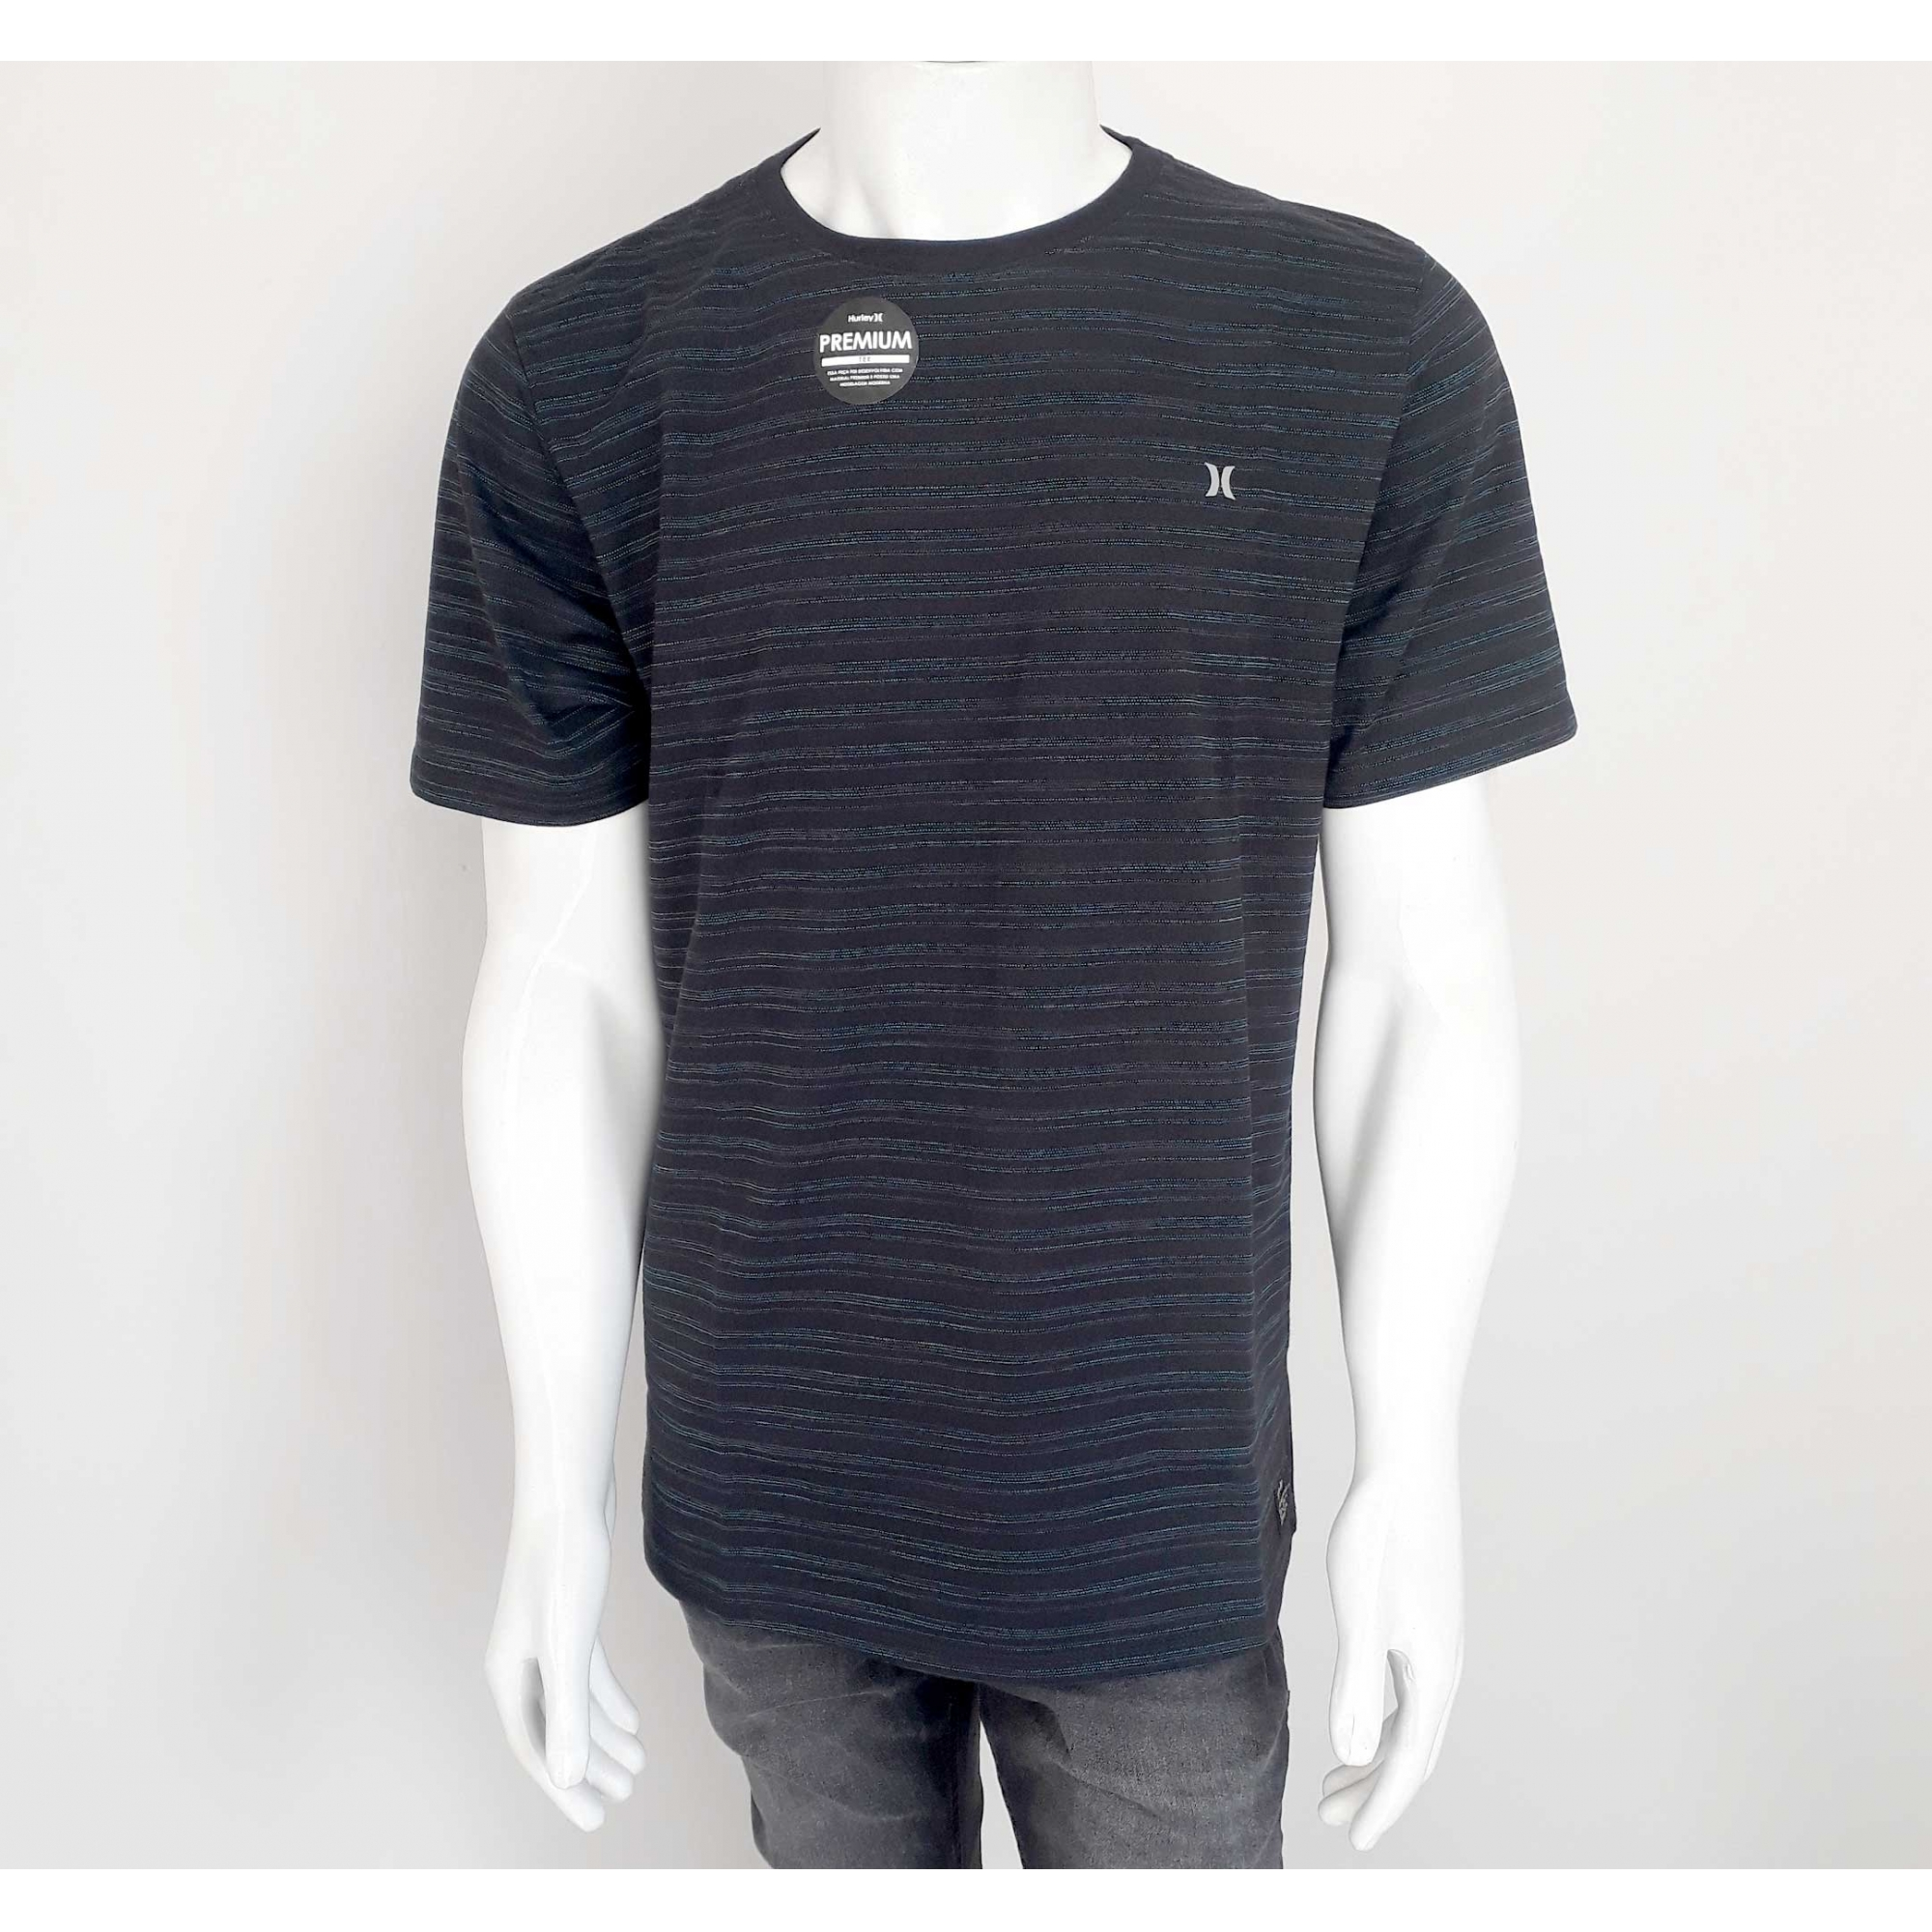 Camiseta Hurley Especial 639112 - GG